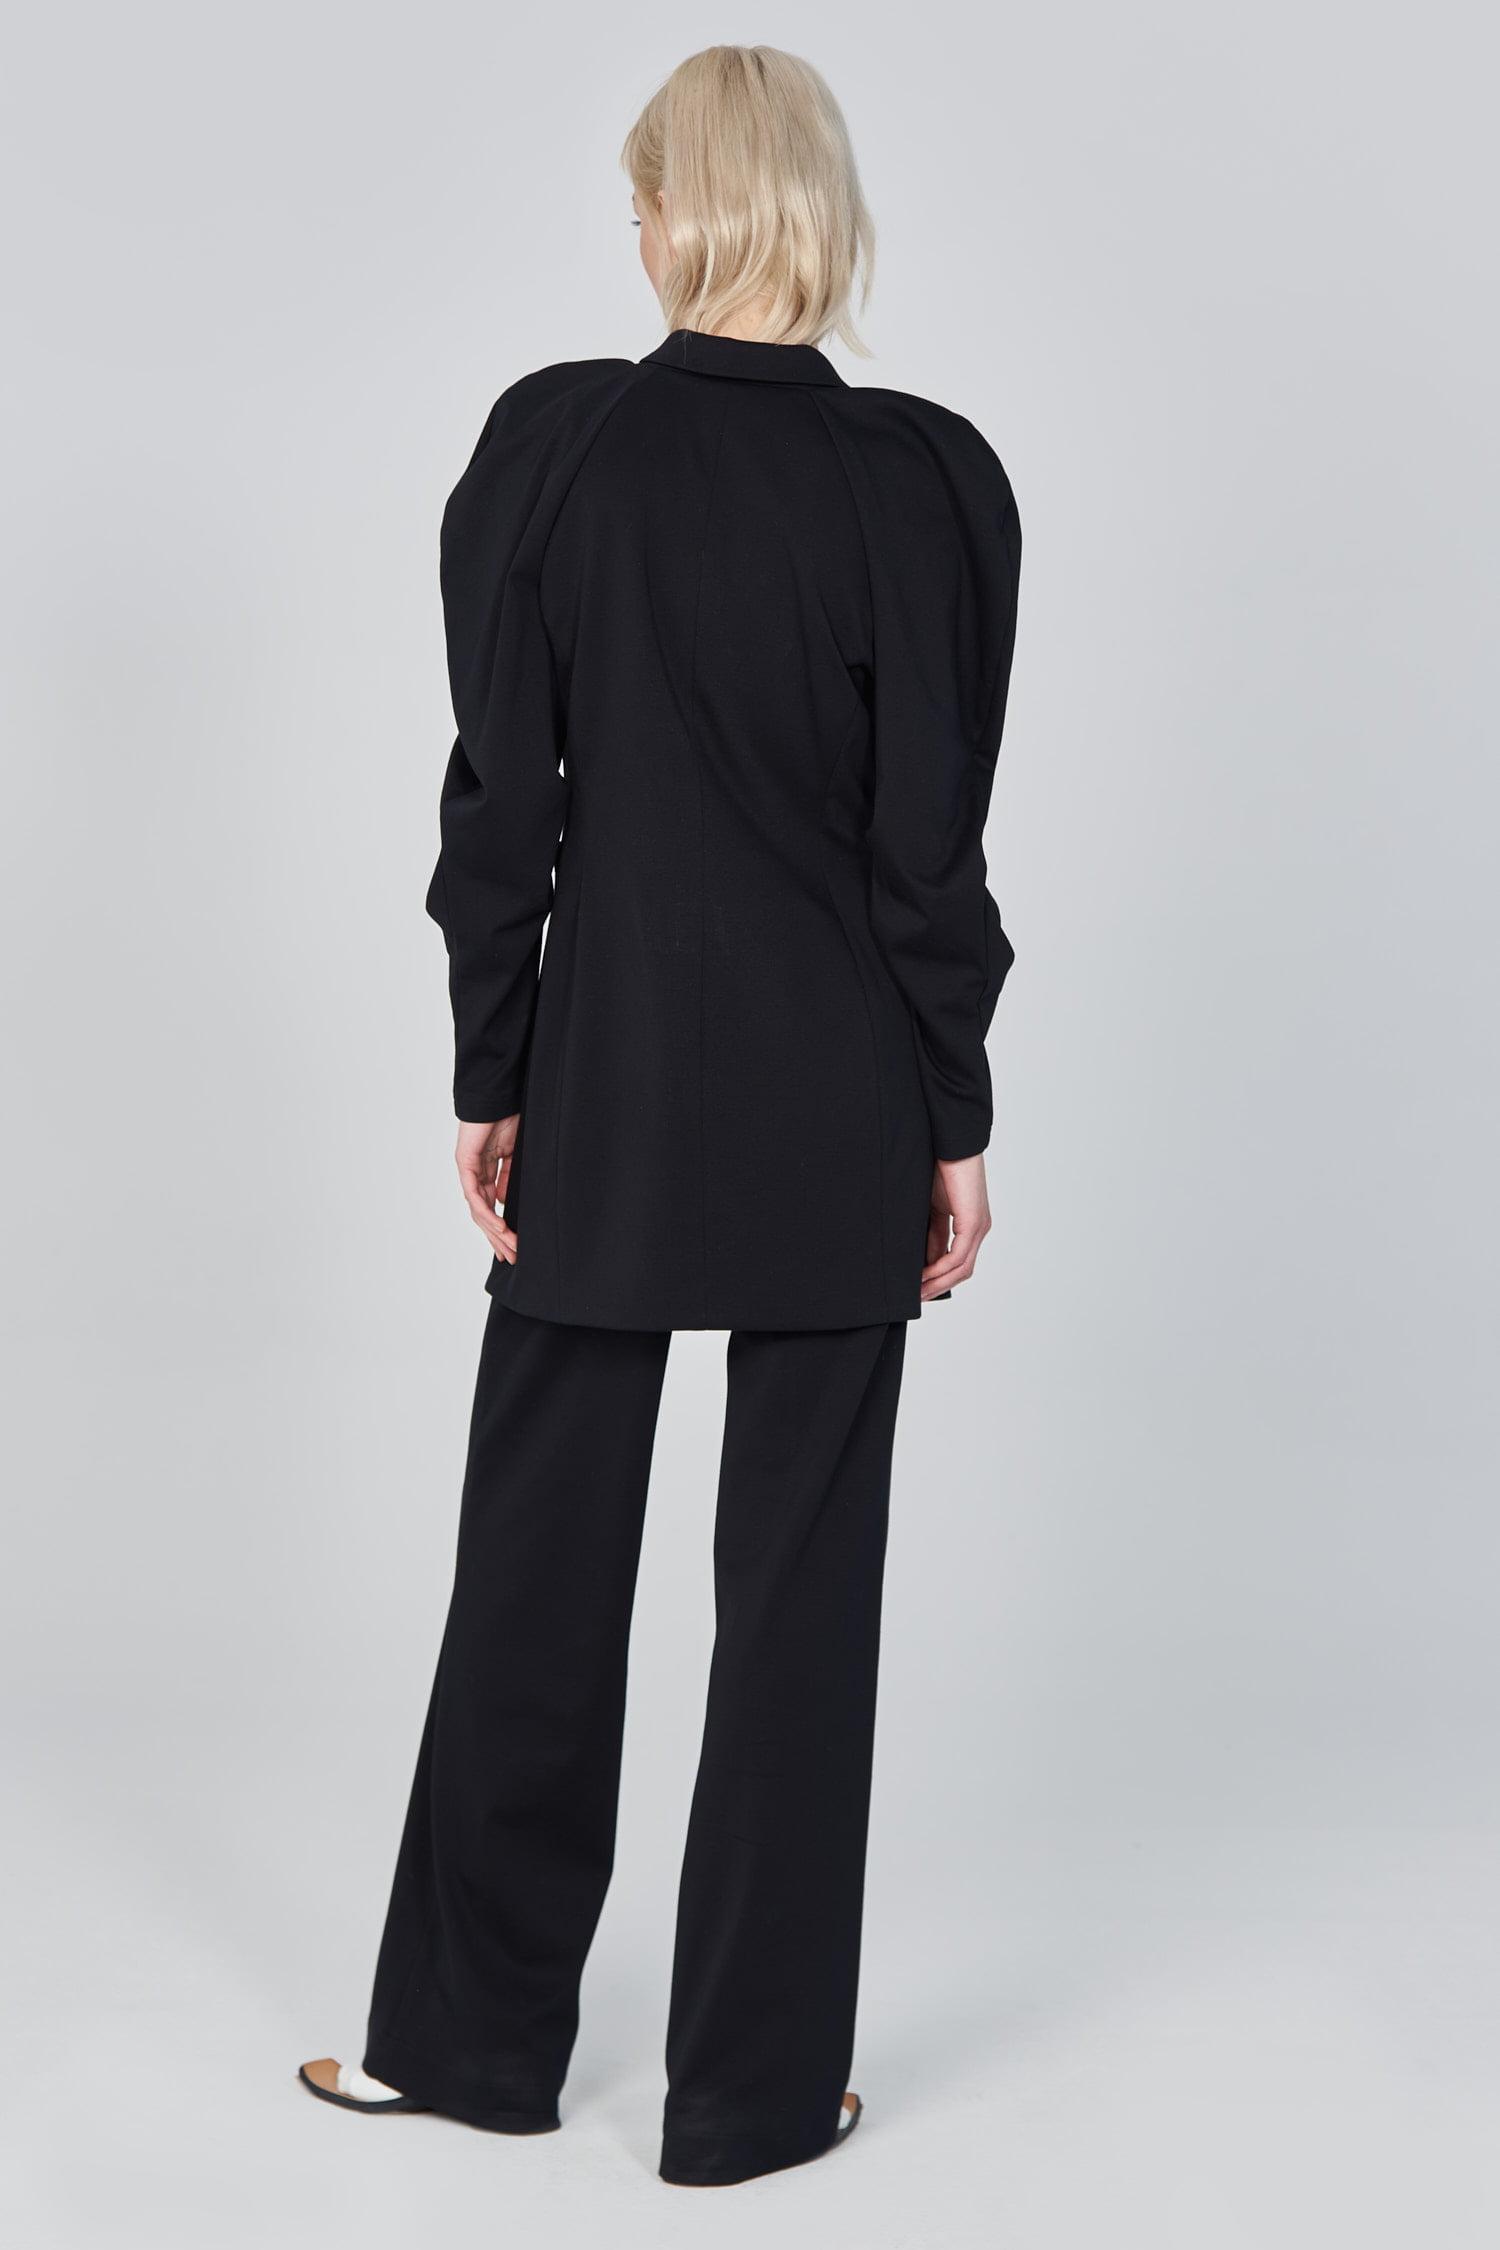 Acephala Ss21 Black Long Tailored Jacket Back